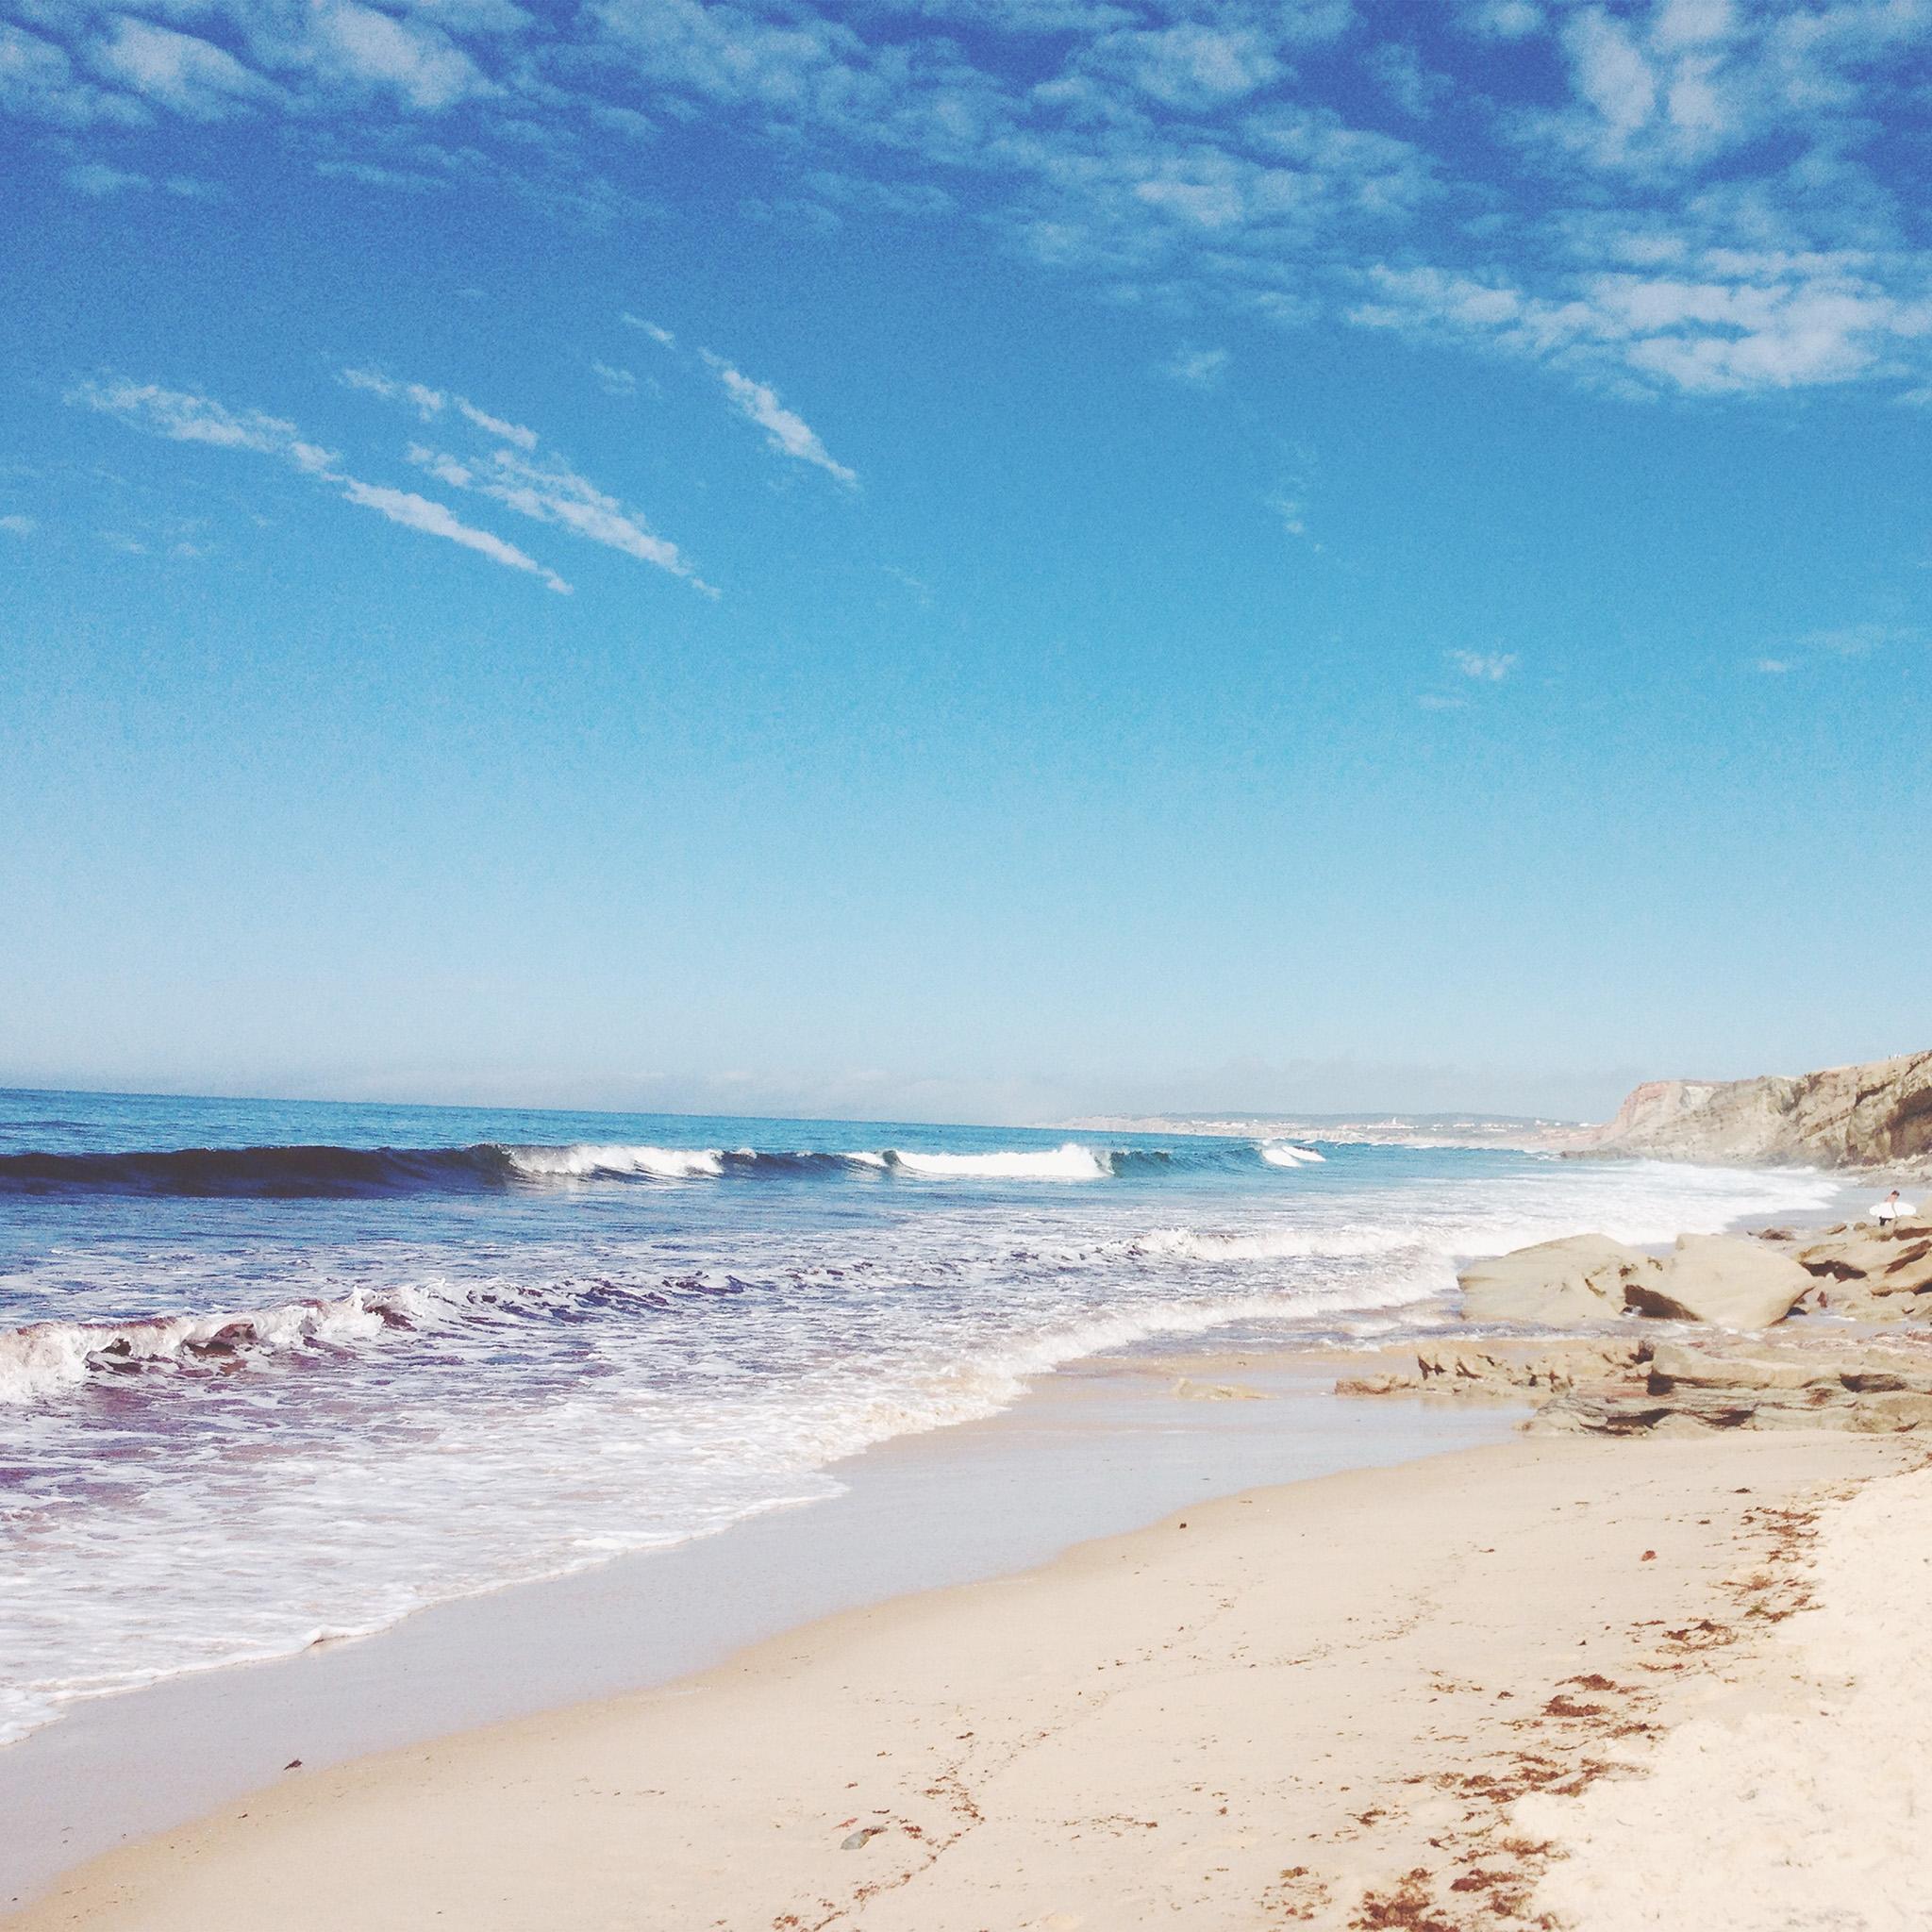 Ocean Beach: Mx22-sea-nature-ocean-beach-cold-holiday